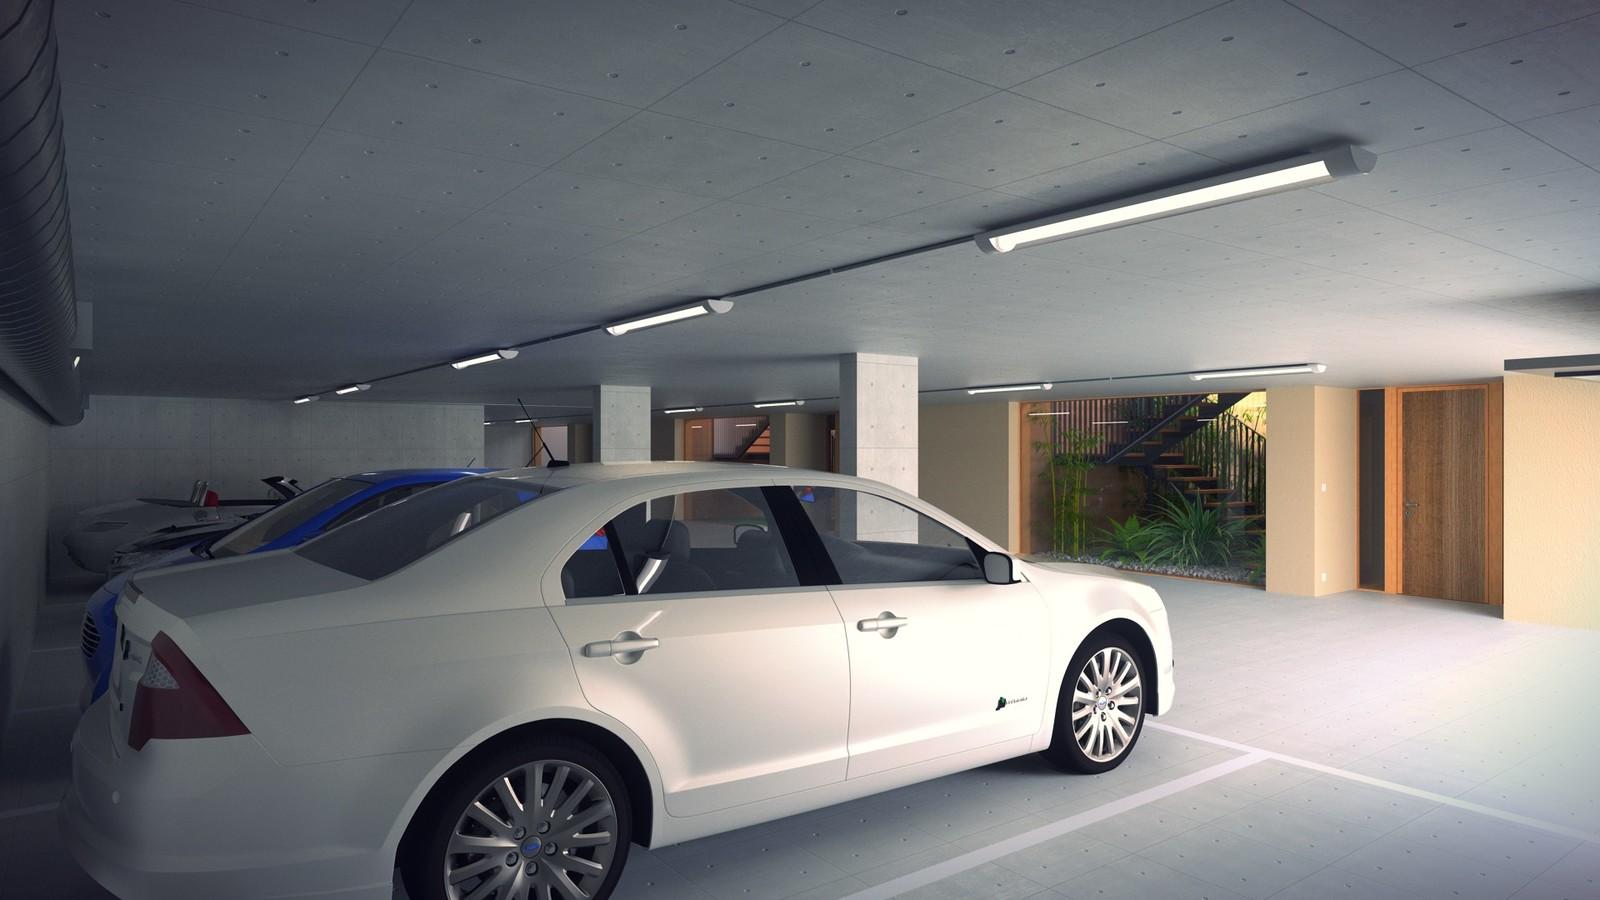 22 A1309-Villas Portier 3d STAIRCASE-GARAGE-Garage SE Corner 02 Open Post  KP webpage of project: http://www.kemppro.com/KP_3D_communication_3_Villas_Veyrier.html